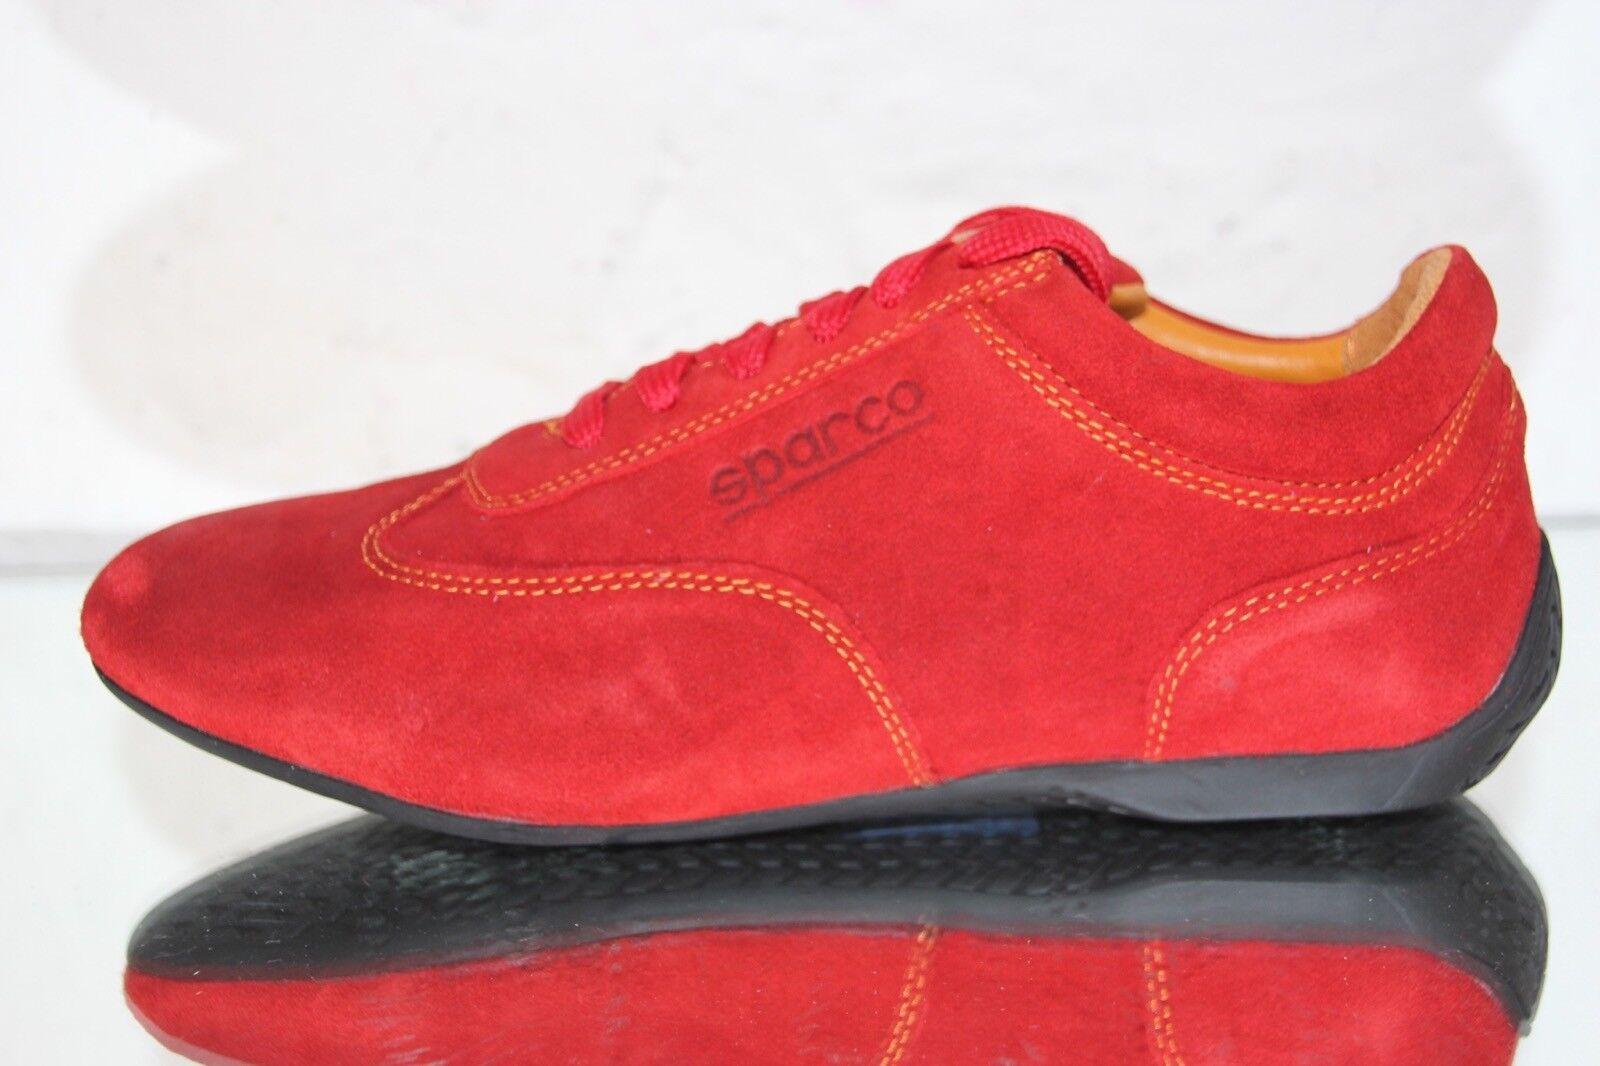 ☆ SPARCO Fahrerschuhe, Sneaker Racing Leder IMOLA rot rosso Gr.44 ☆ Ferrari Alfa